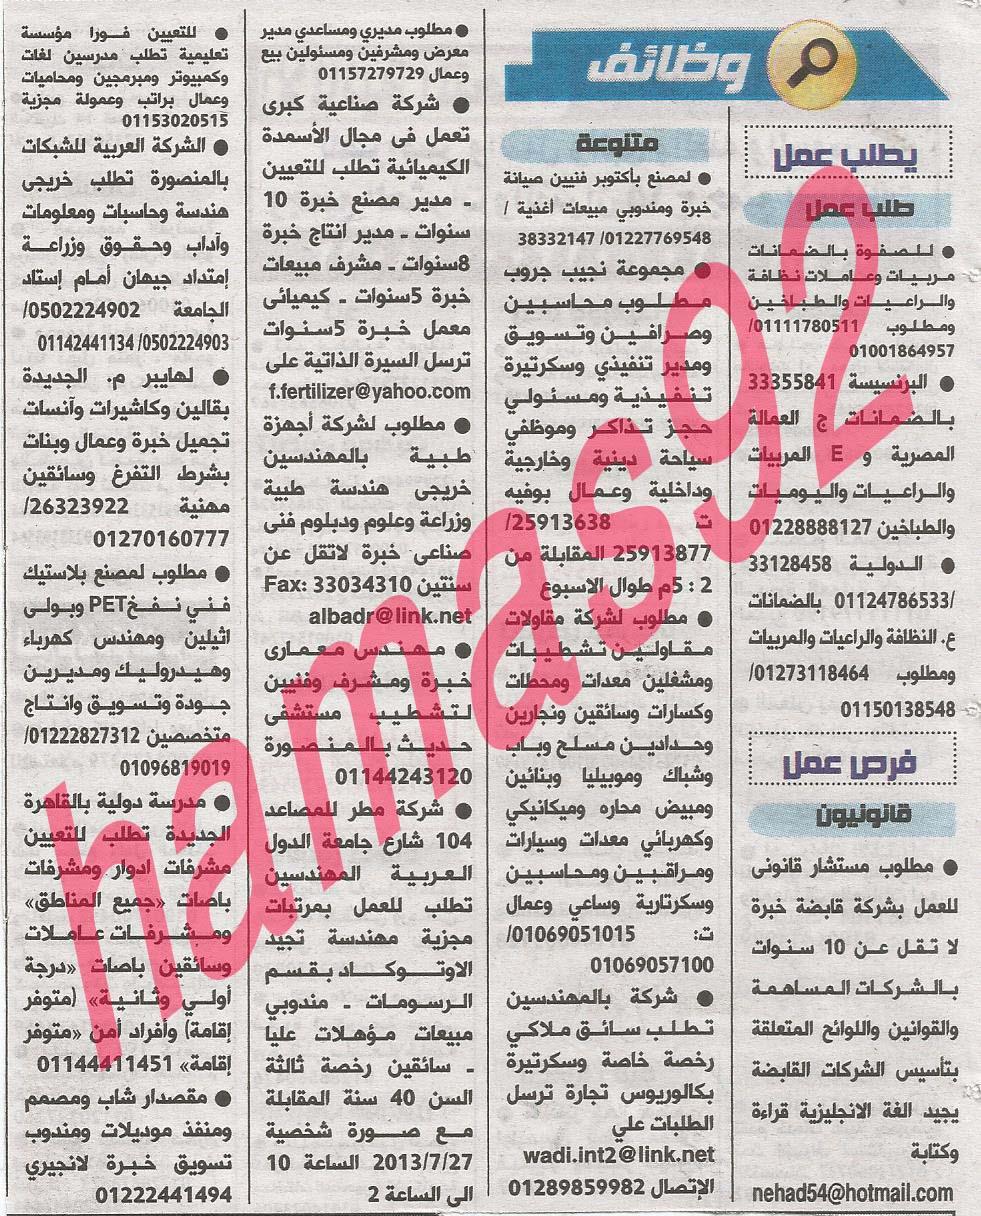 13459cc66 وظائف مصر : وظائف جريدة بانوراما الاهرام المصرية اليوم الاثنين 20 ...